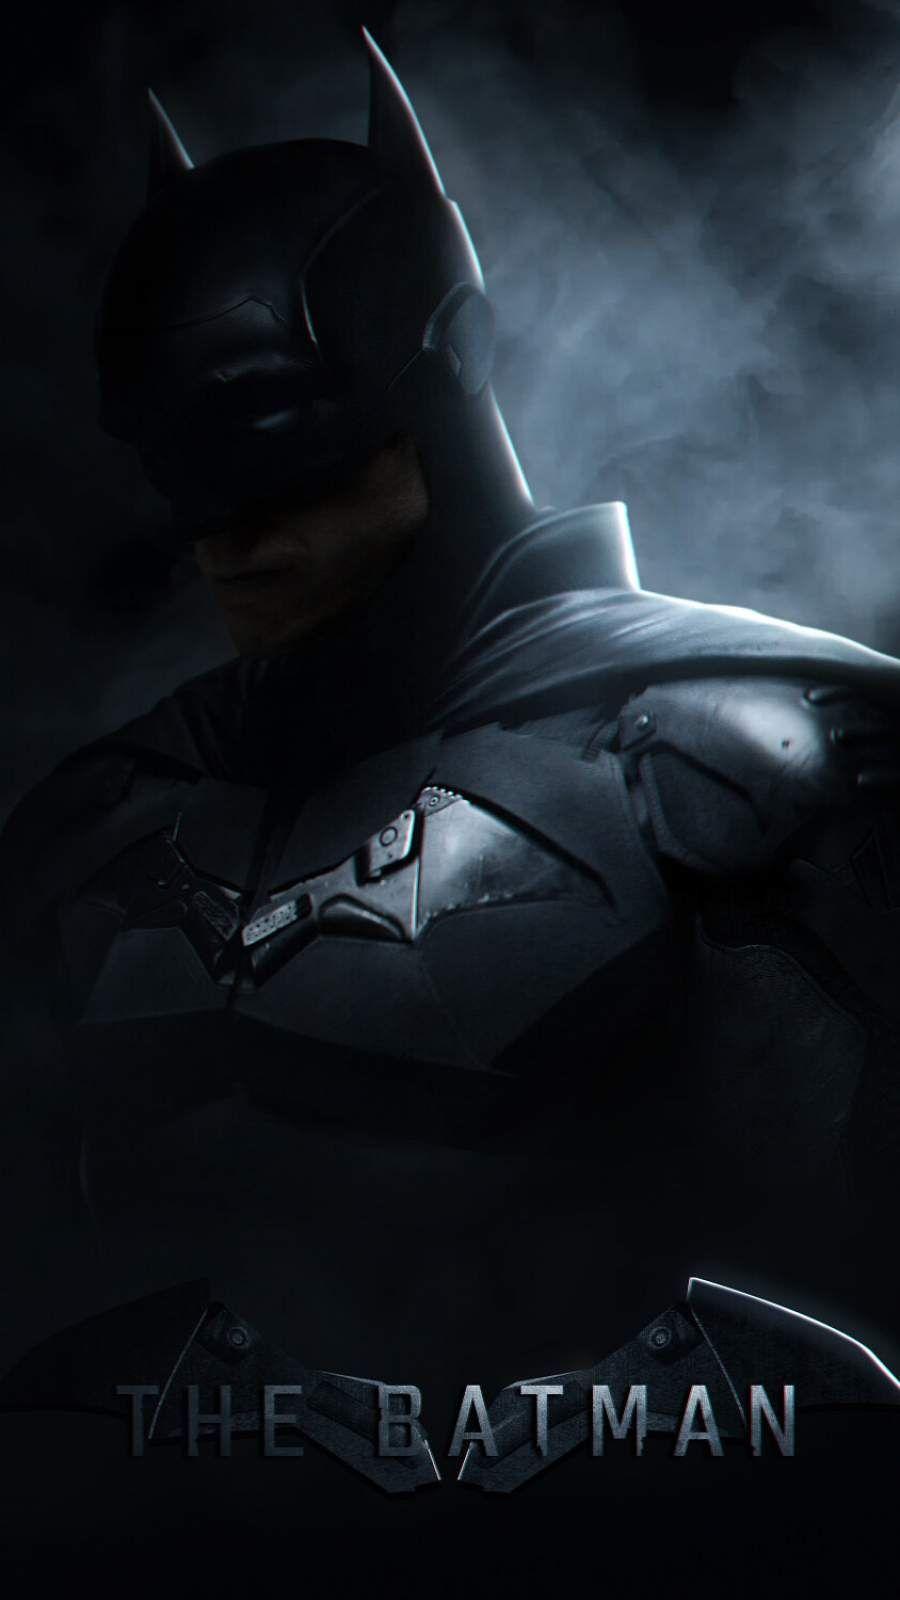 The Batman Iphone Wallpaper In 2020 Batman Batman Art Batgirl Art